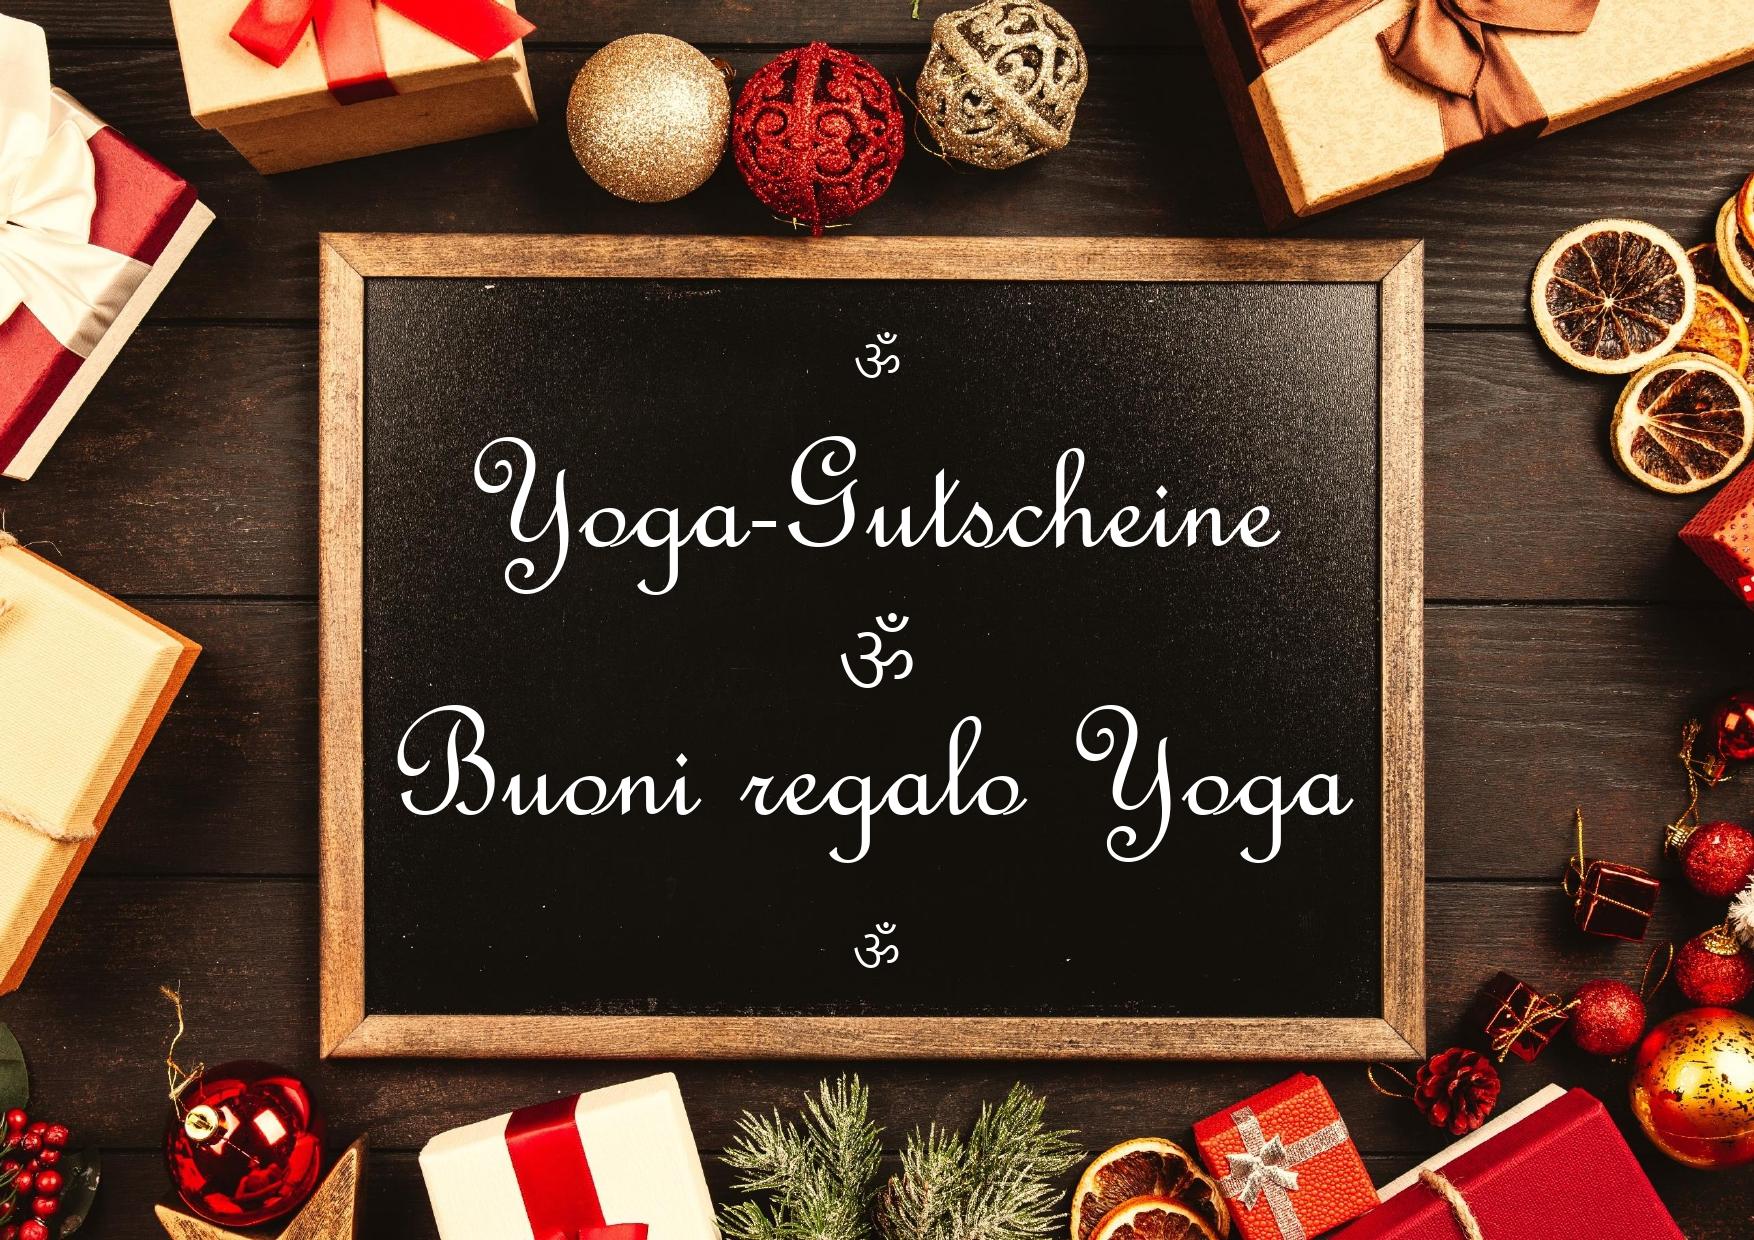 https://www.vronifischer.yoga/kurse-corsi/